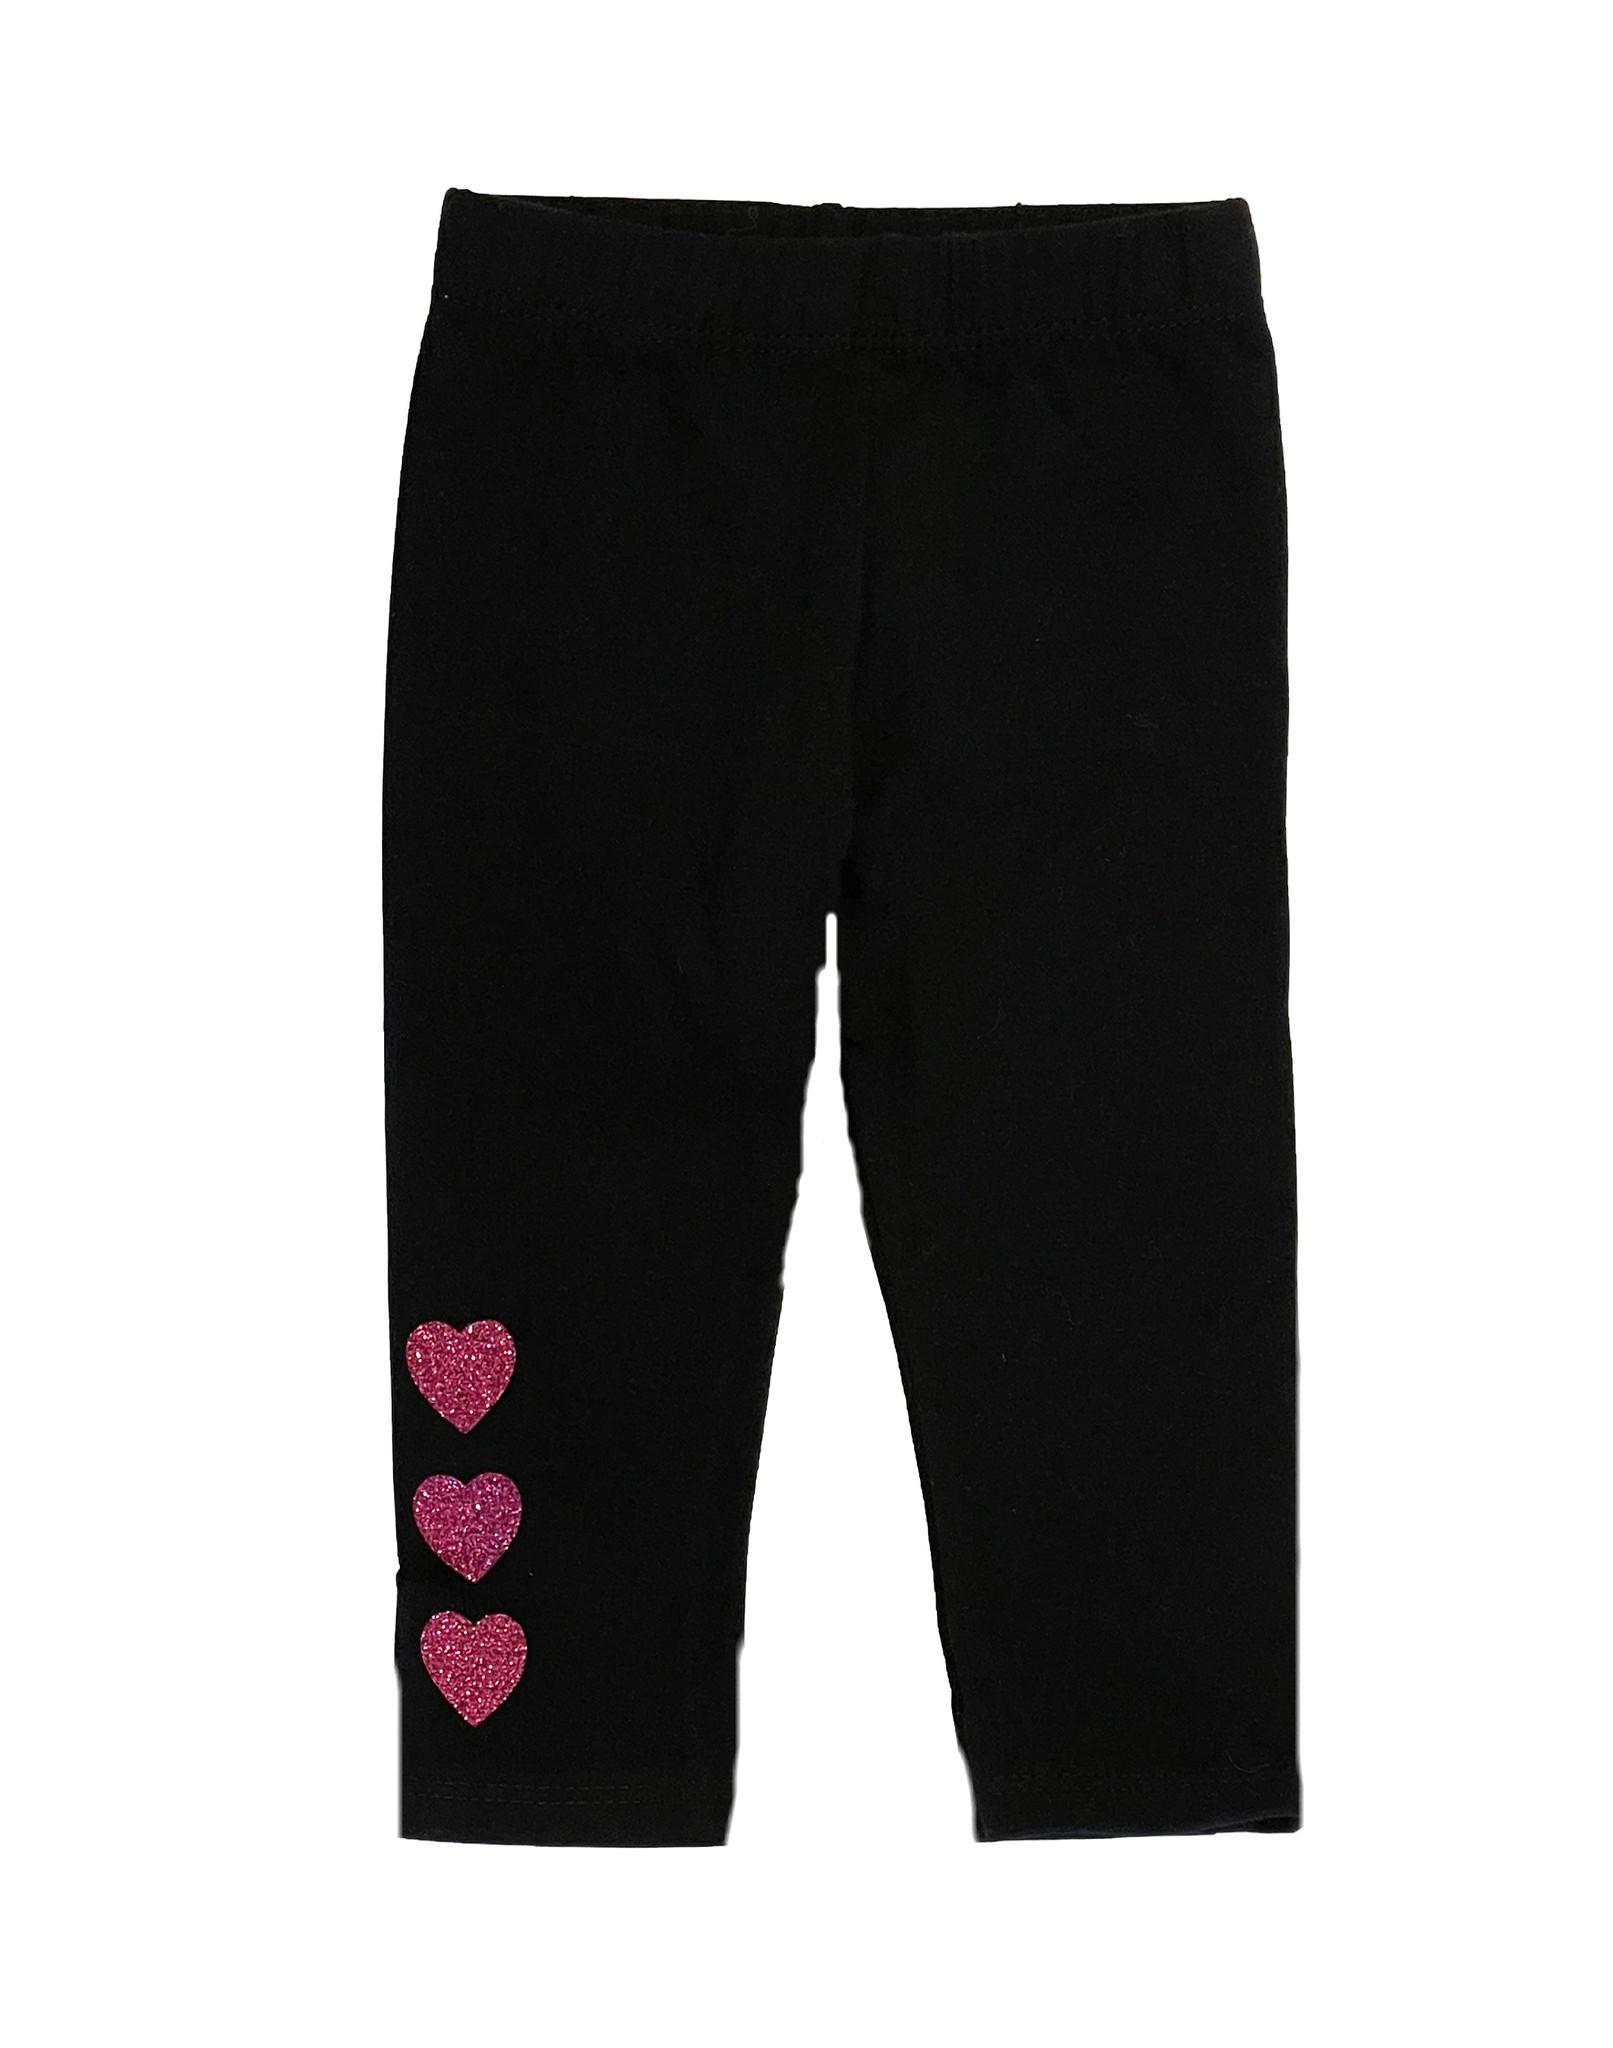 Small Change Pink Glitter Triple Heart Leggings